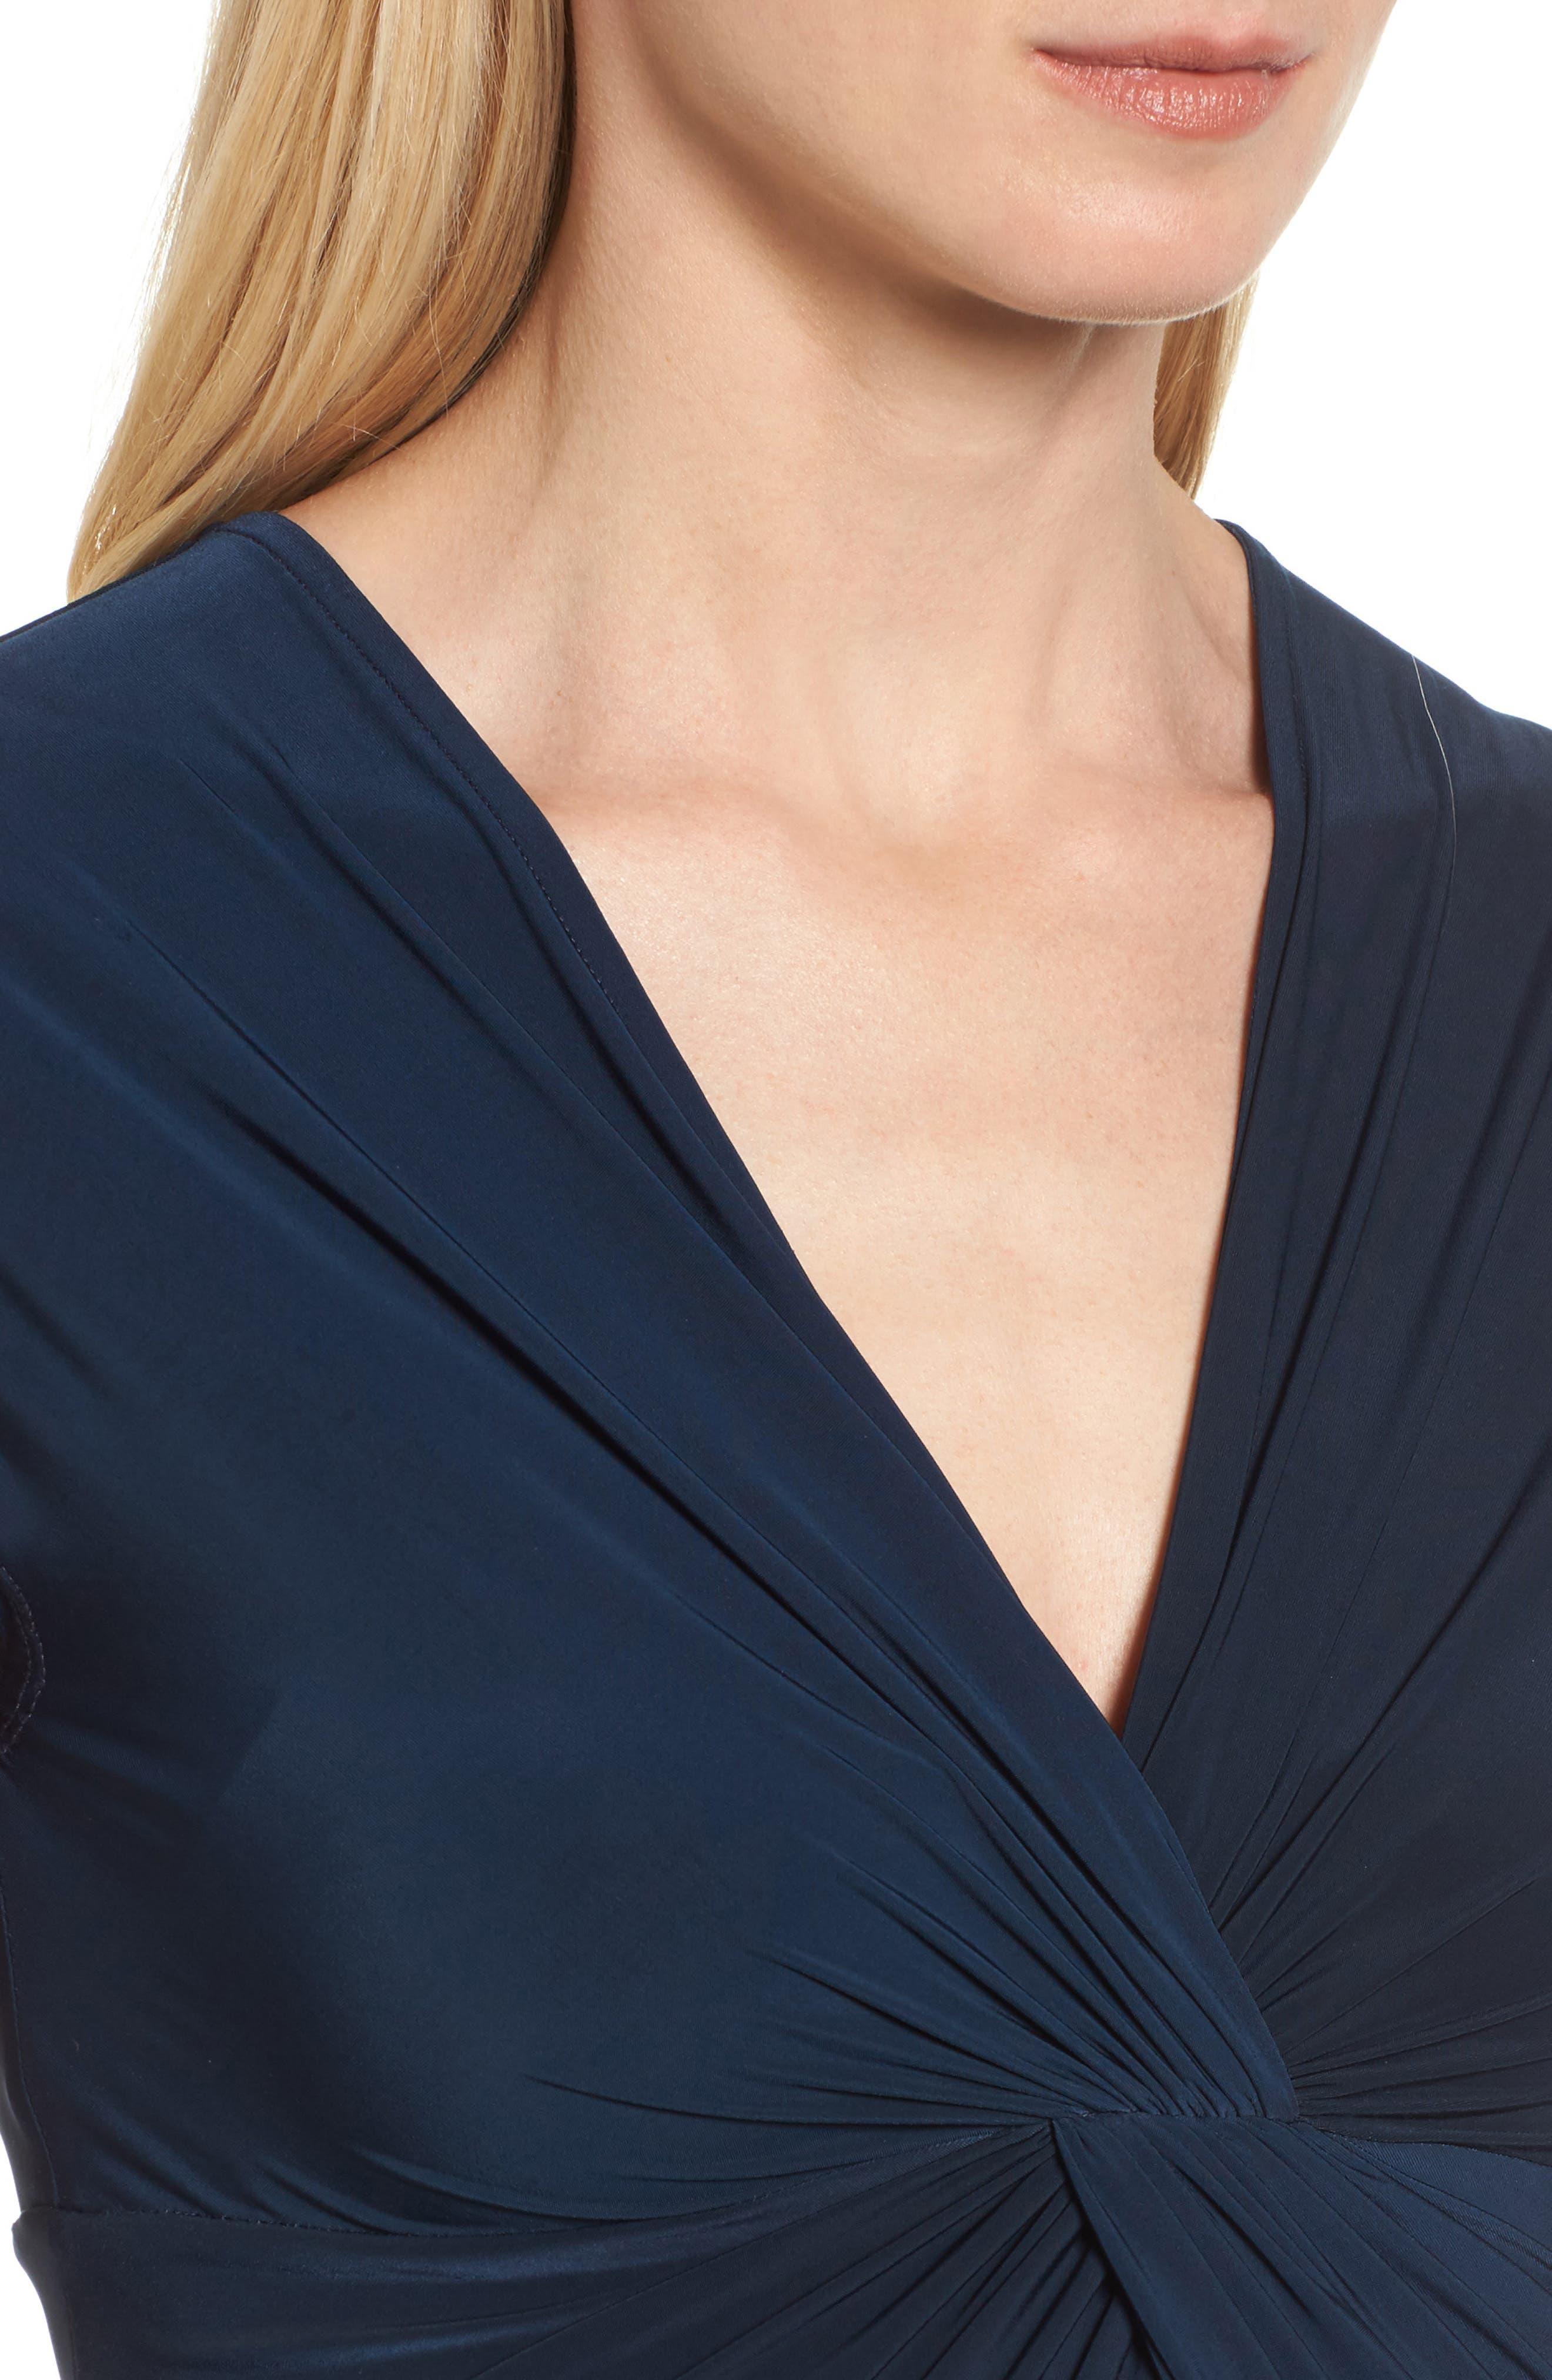 'Carla' Knot Front Jersey Maternity Dress,                             Alternate thumbnail 4, color,                             DARKEST NAVY